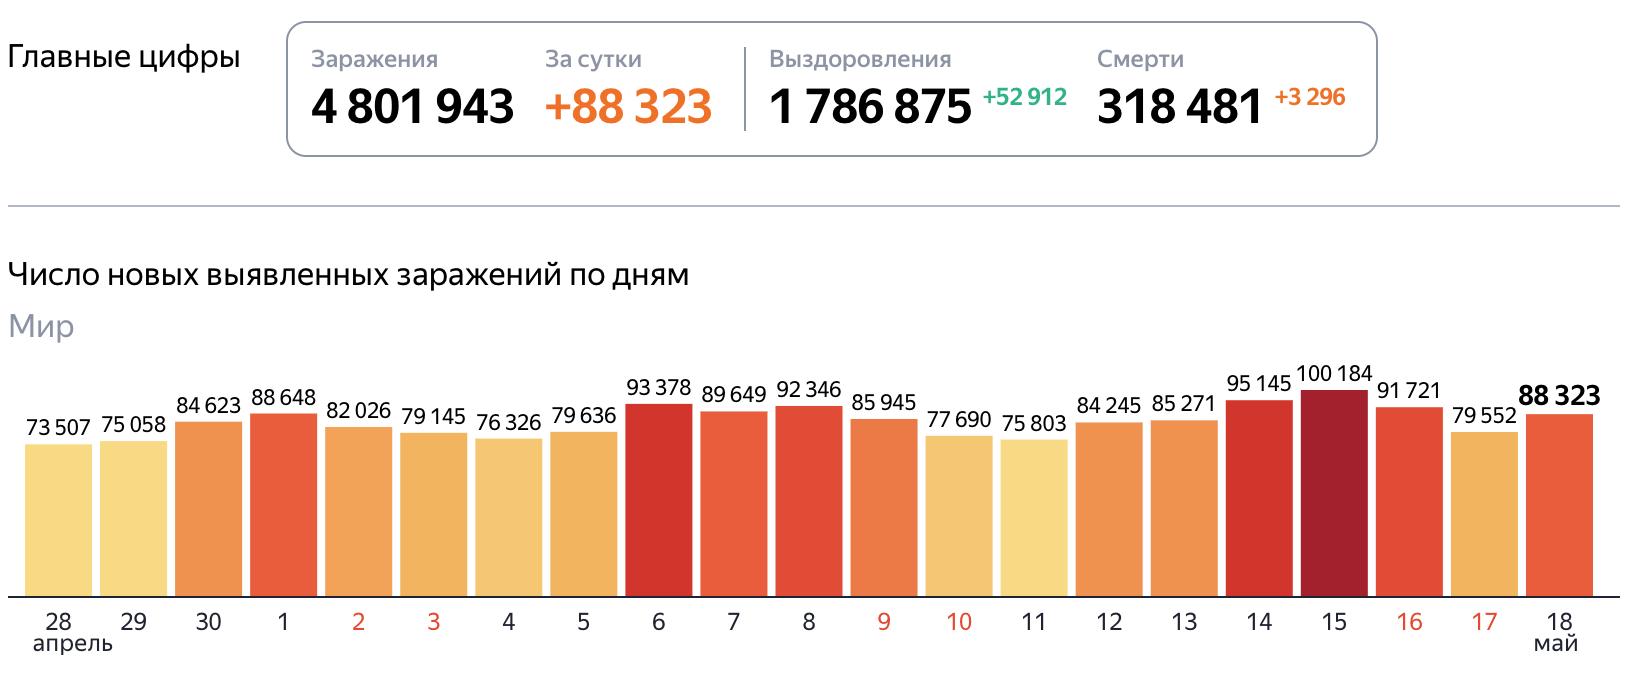 Статистика коронавируса в мире на 19 мая 2020 года